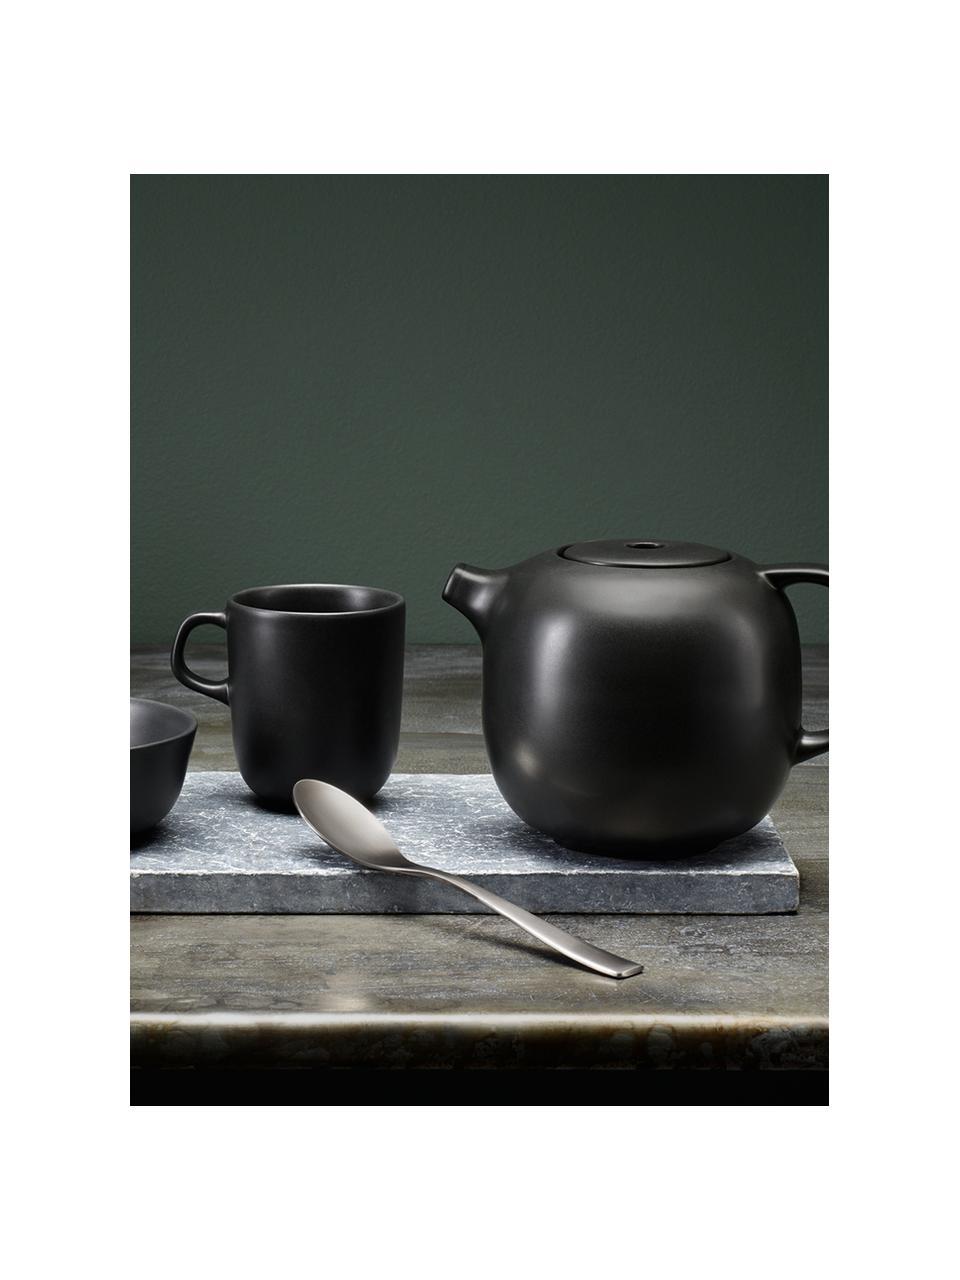 Tazza nera opaca Nordic Kitchen 4 pz, Gres, Nero opaco, 300 ml